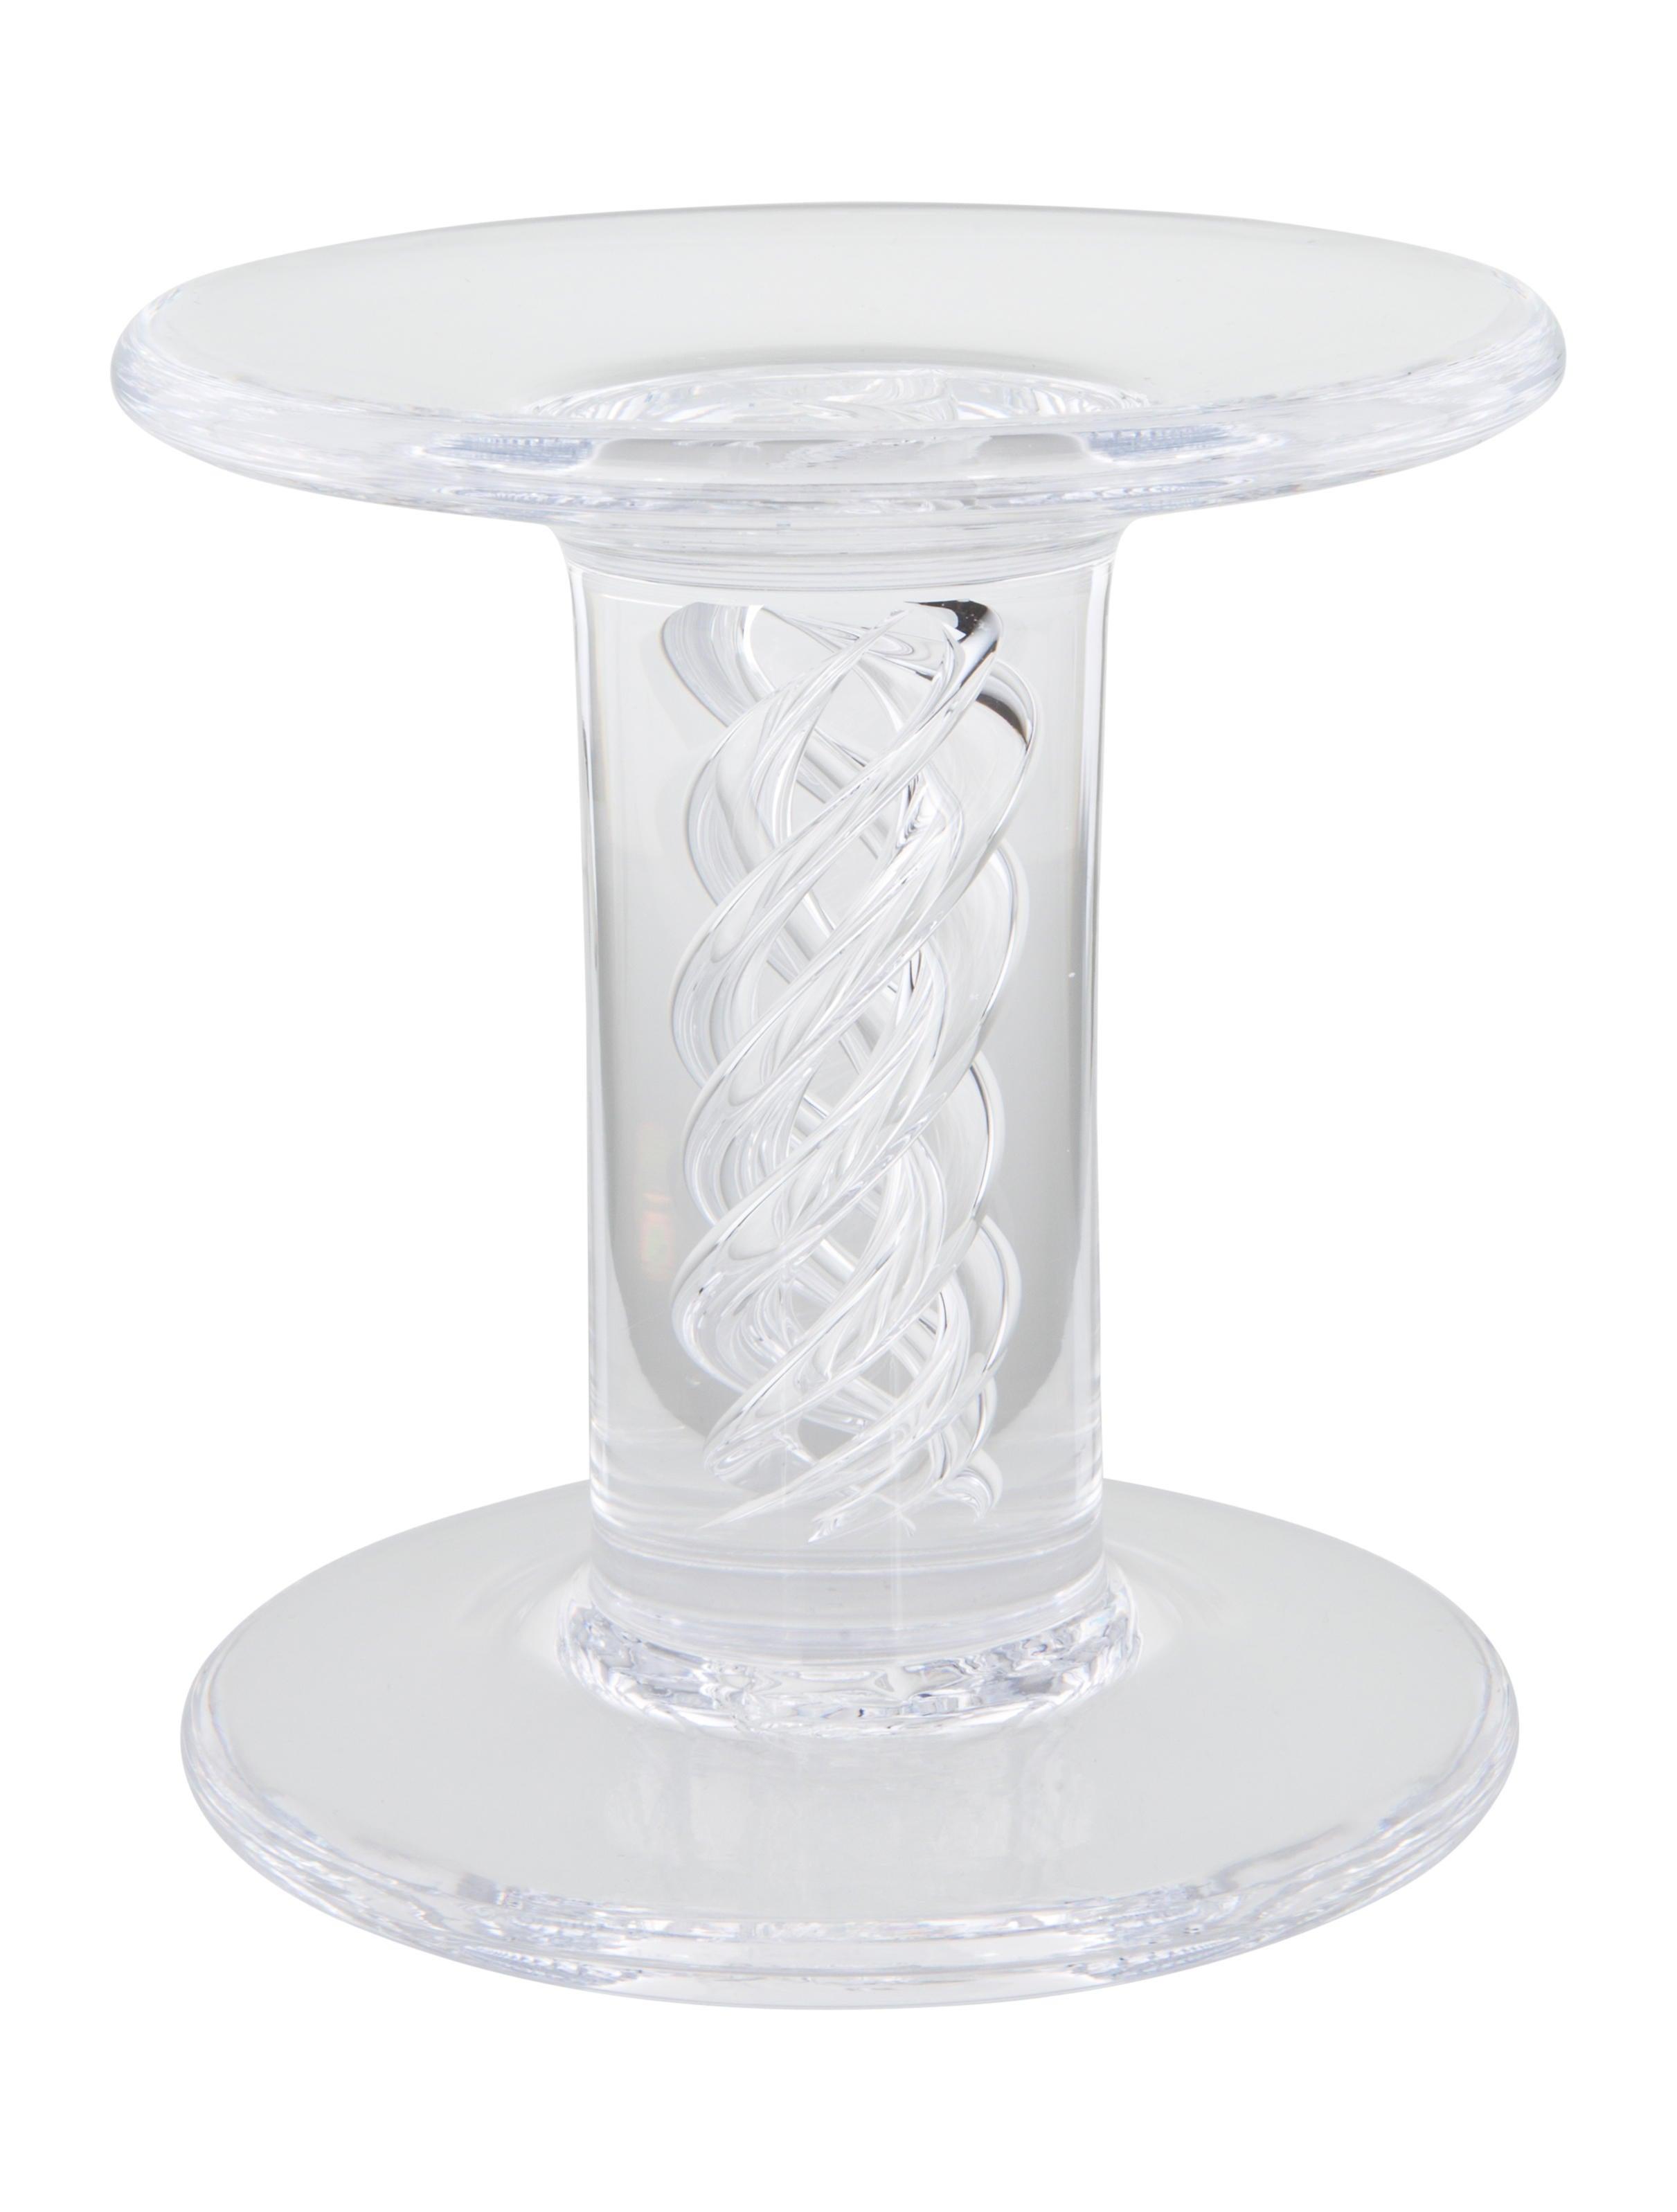 simon pearce swirl glass pillars decor and accessories